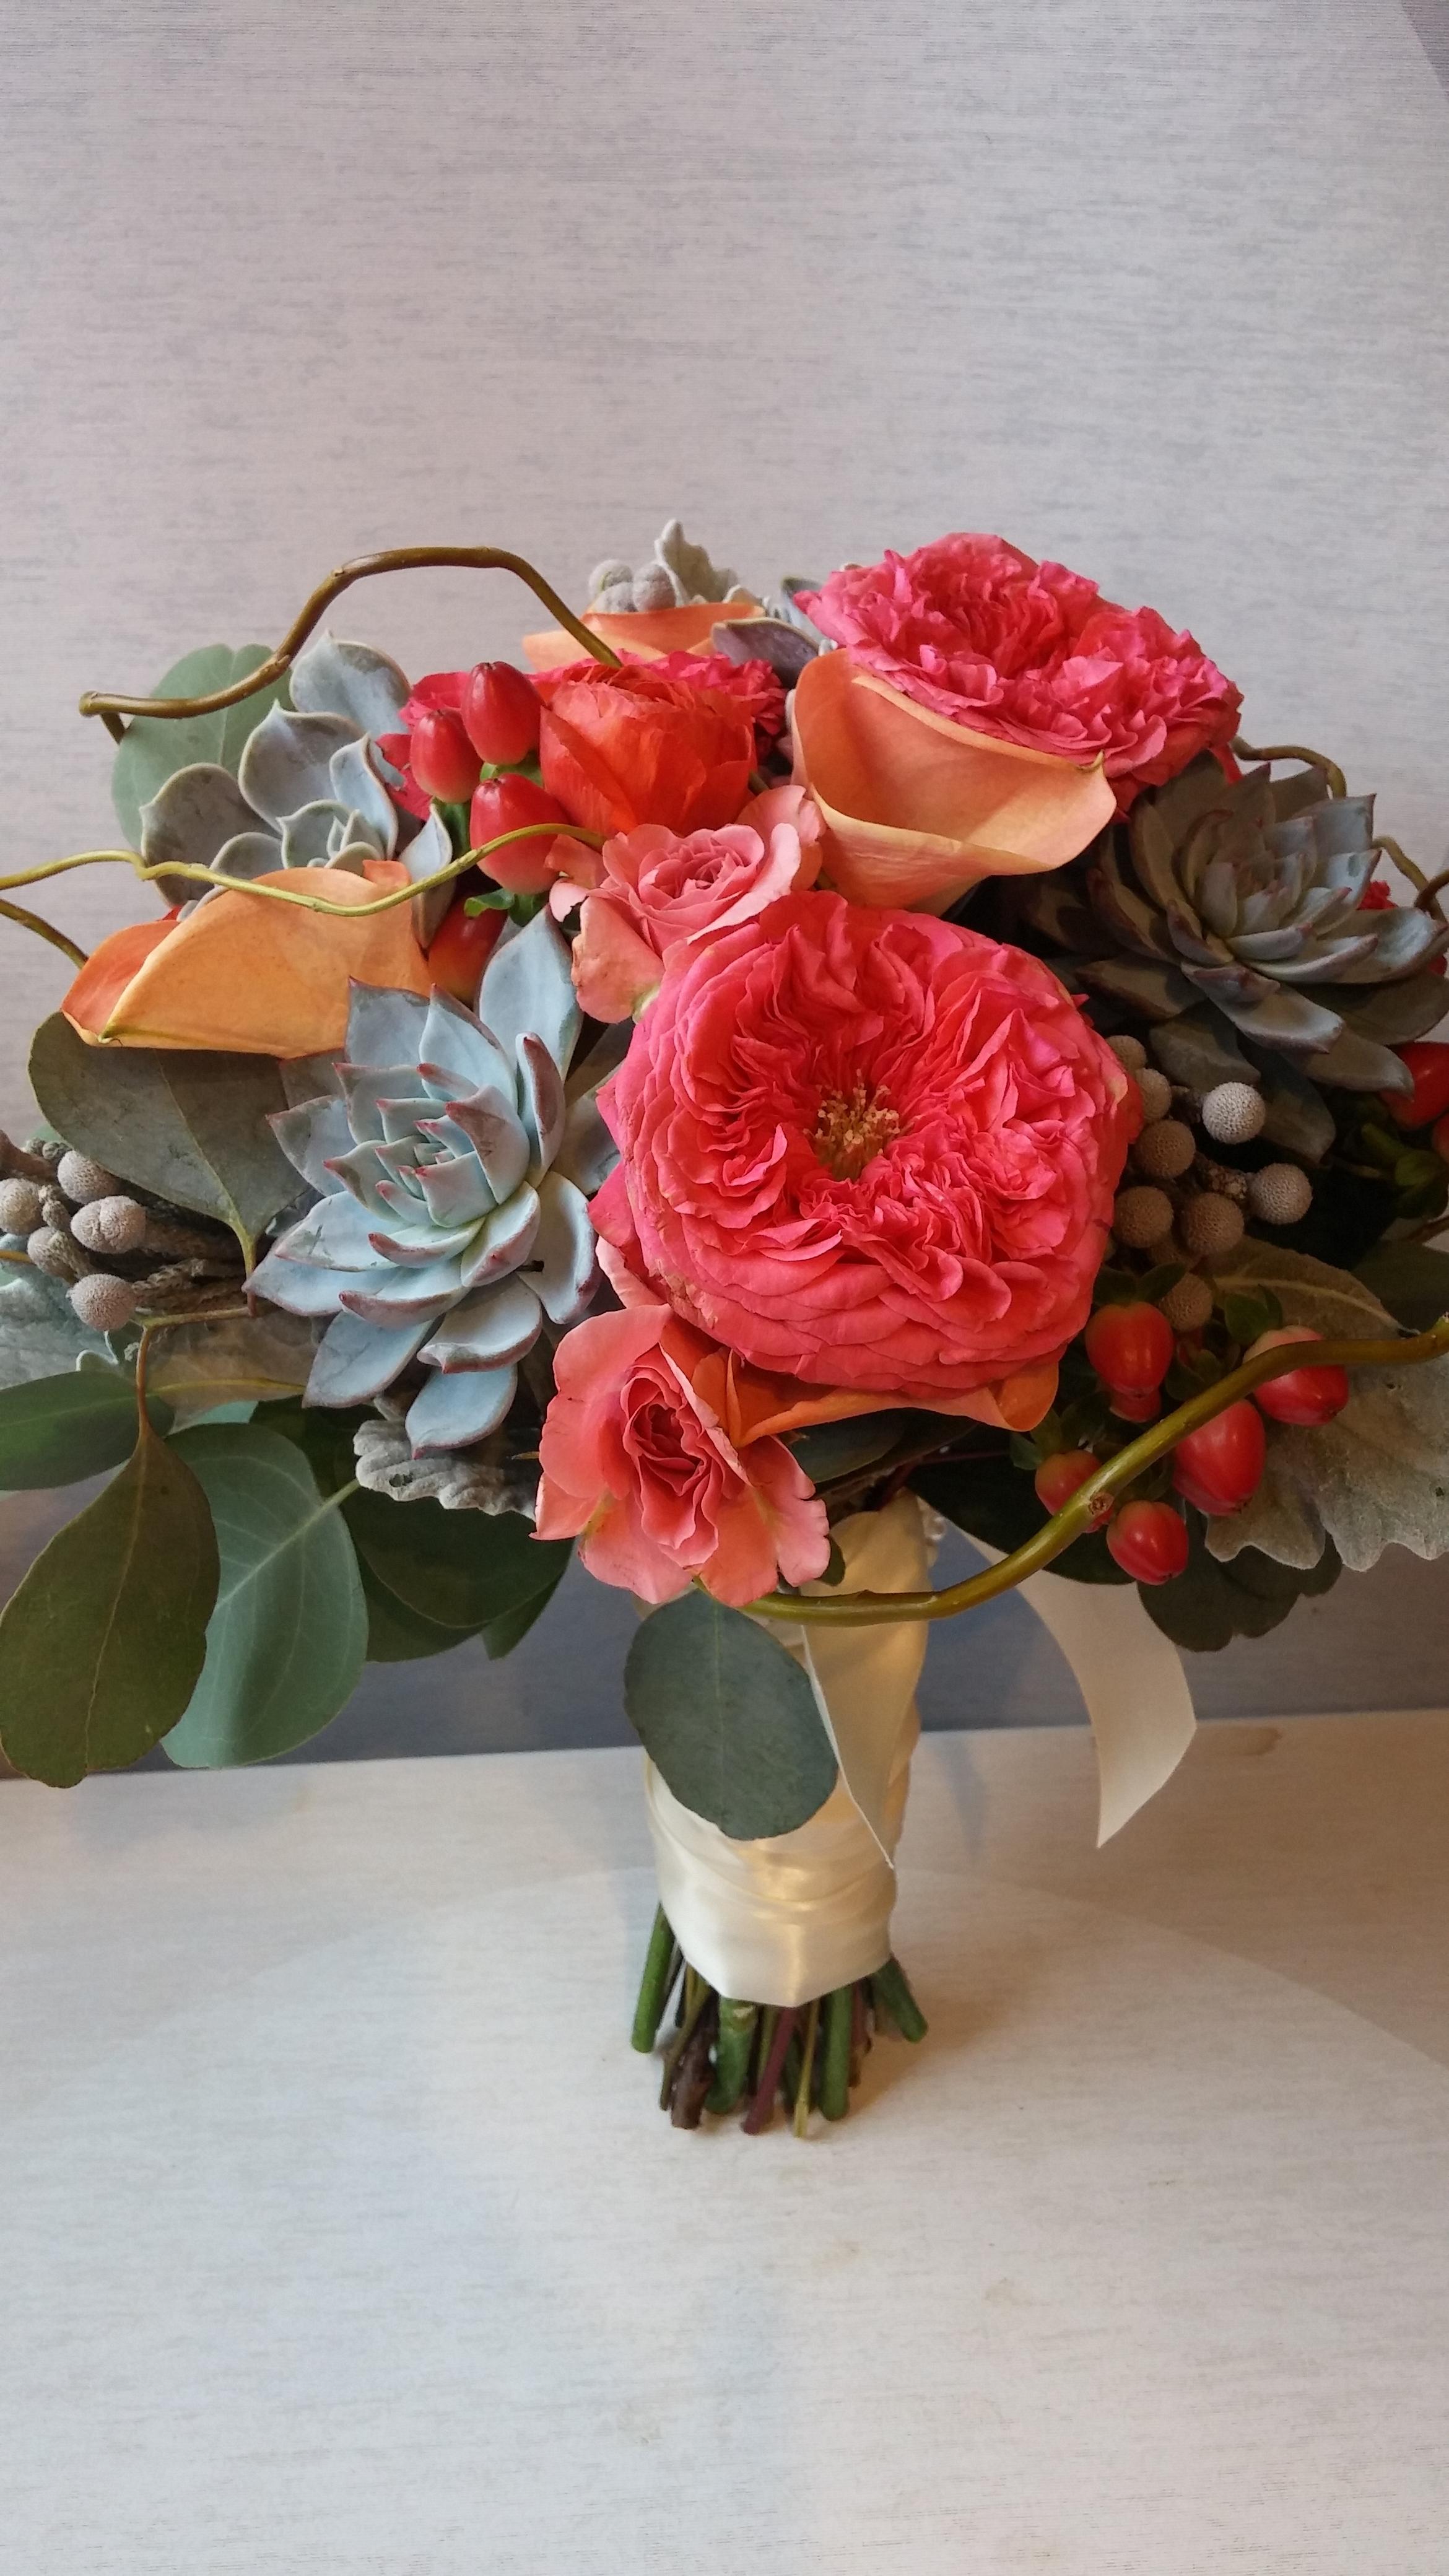 Coral Garden Rose coral rose, minneapolis, garden rose, coral garden rose, succulent